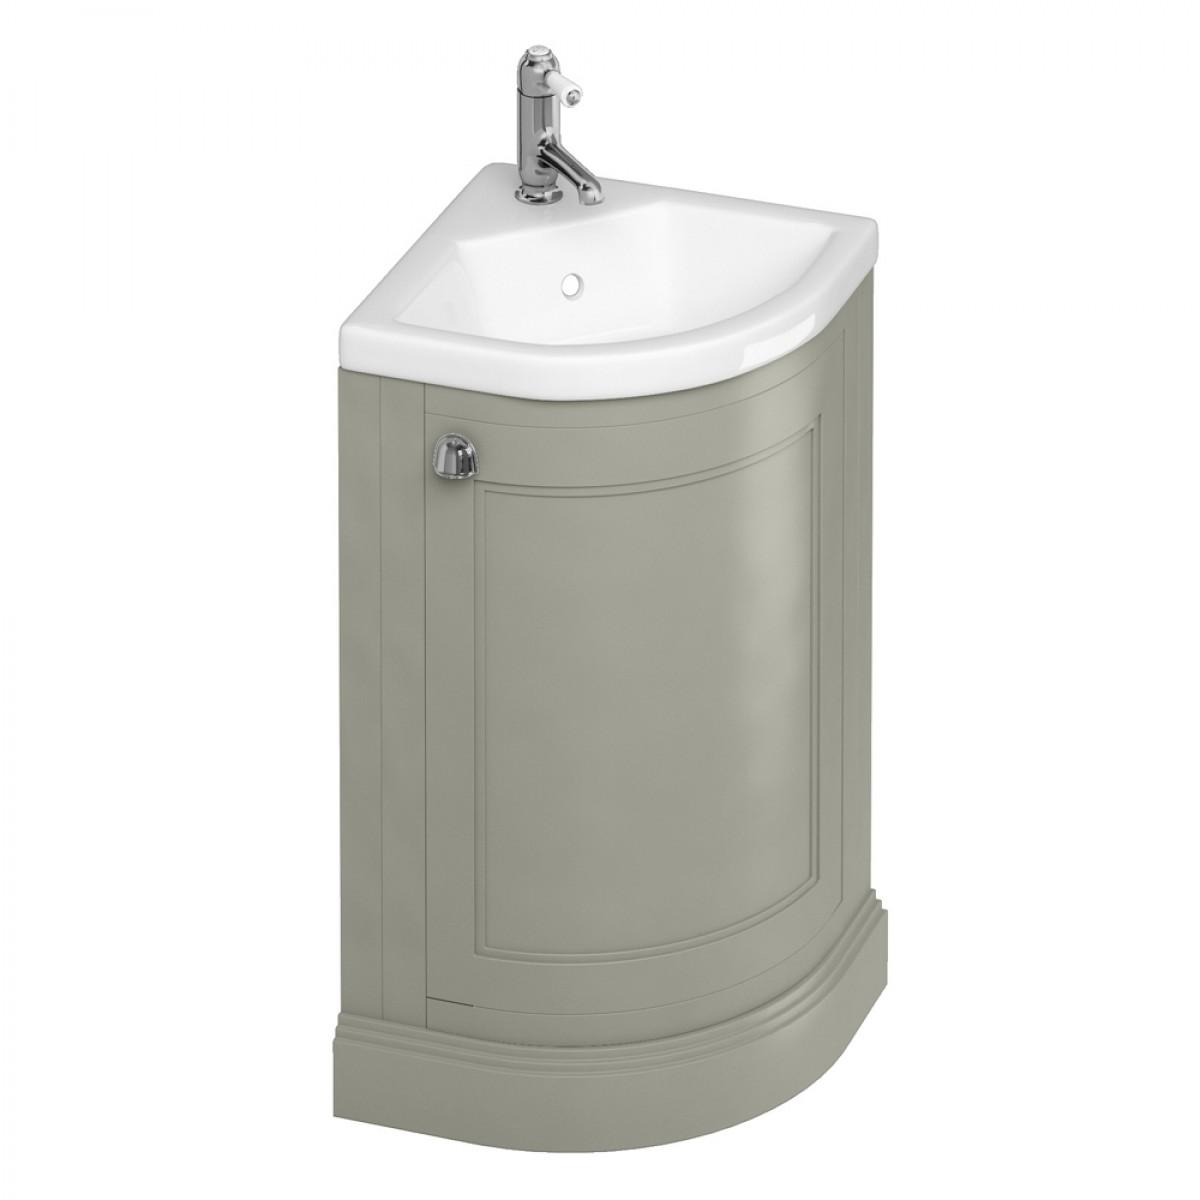 burlington freestanding corner cloakroom vanity unit XGKOAZY